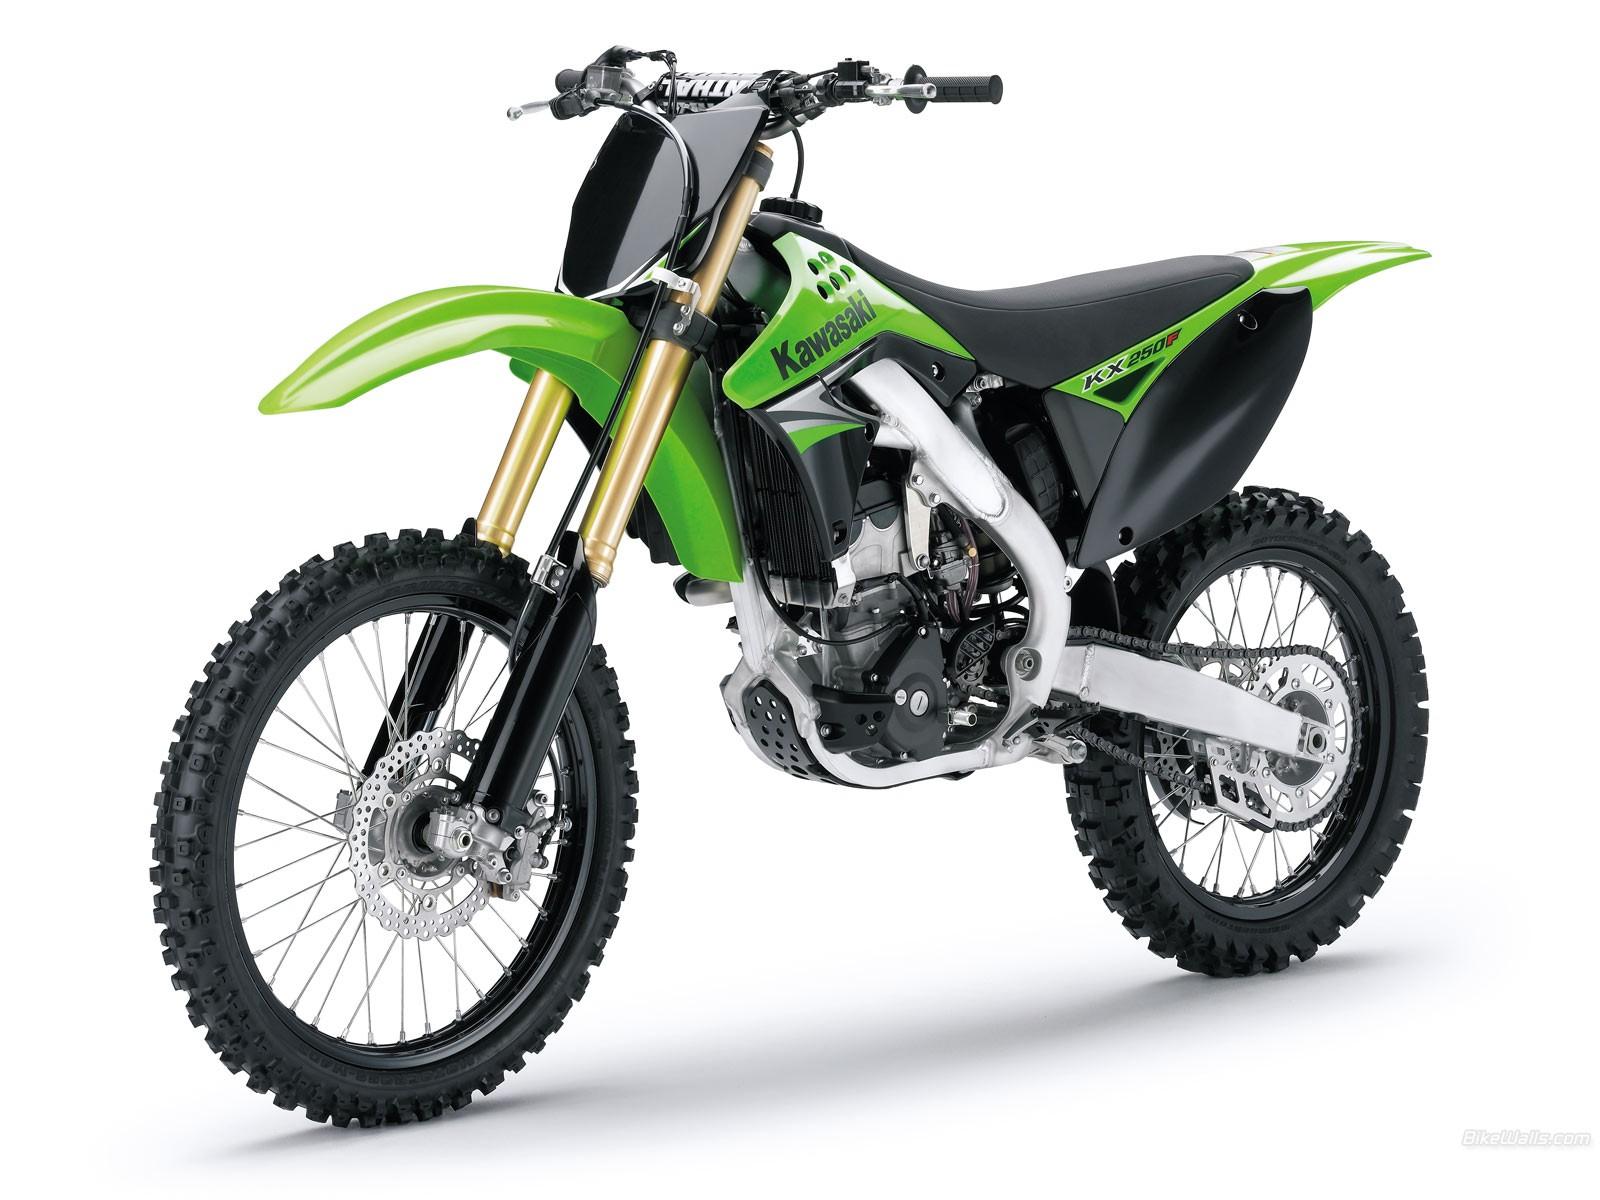 Обои спортивный, z 1000 sx, profile, Kawasaki, Мотоцикл. Мотоциклы foto 12